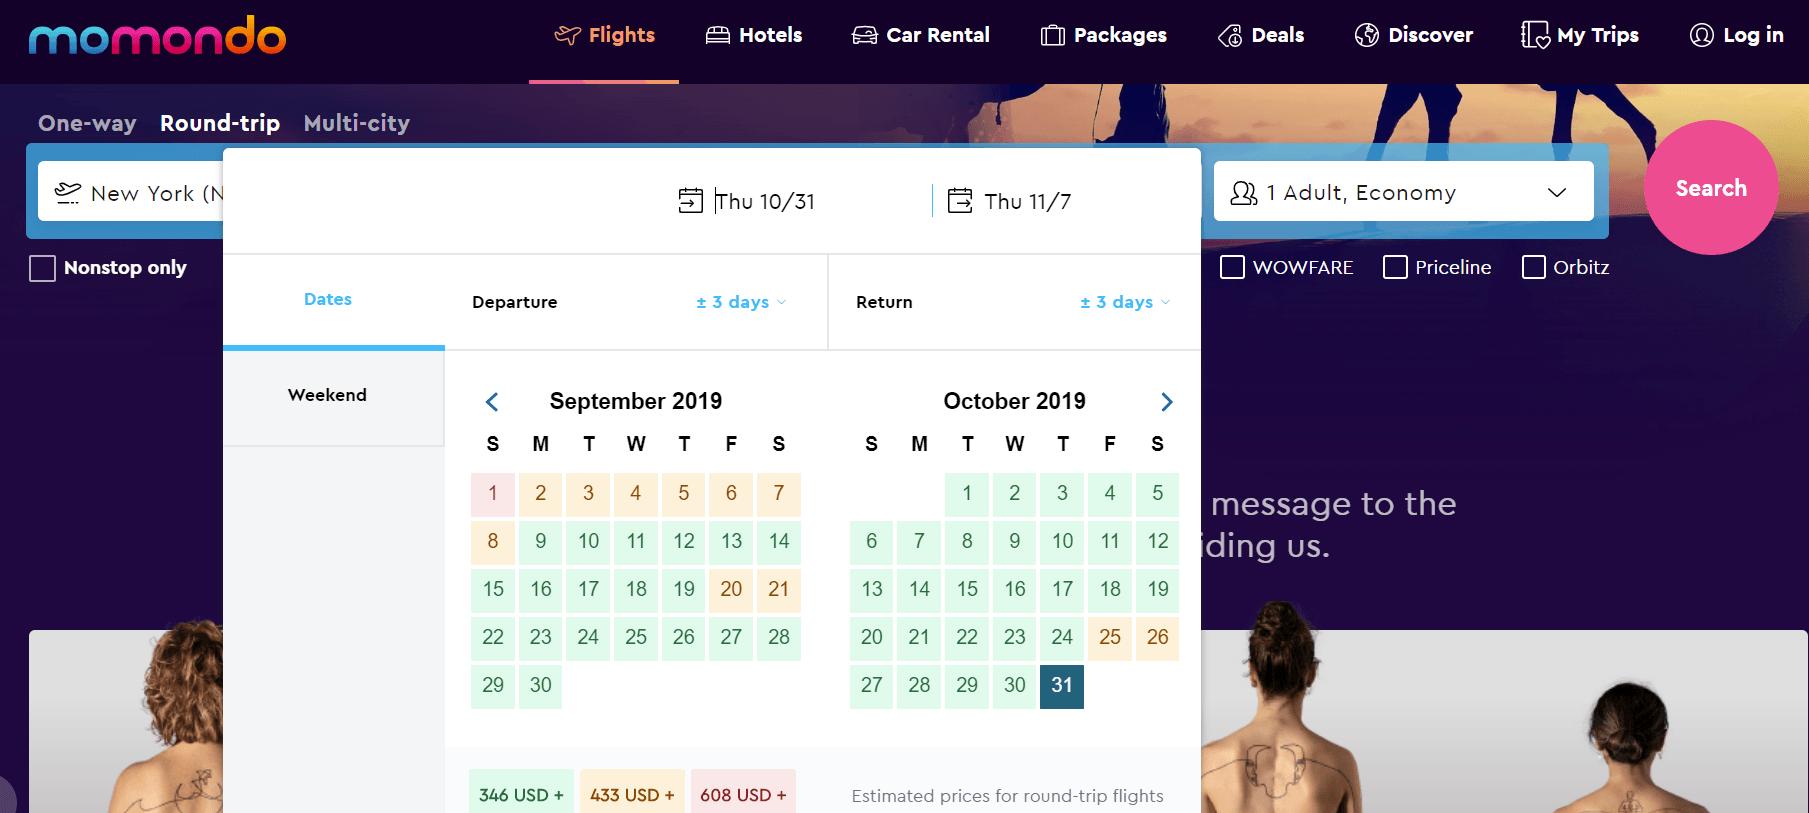 Momondo Flexible Dates Flight Search